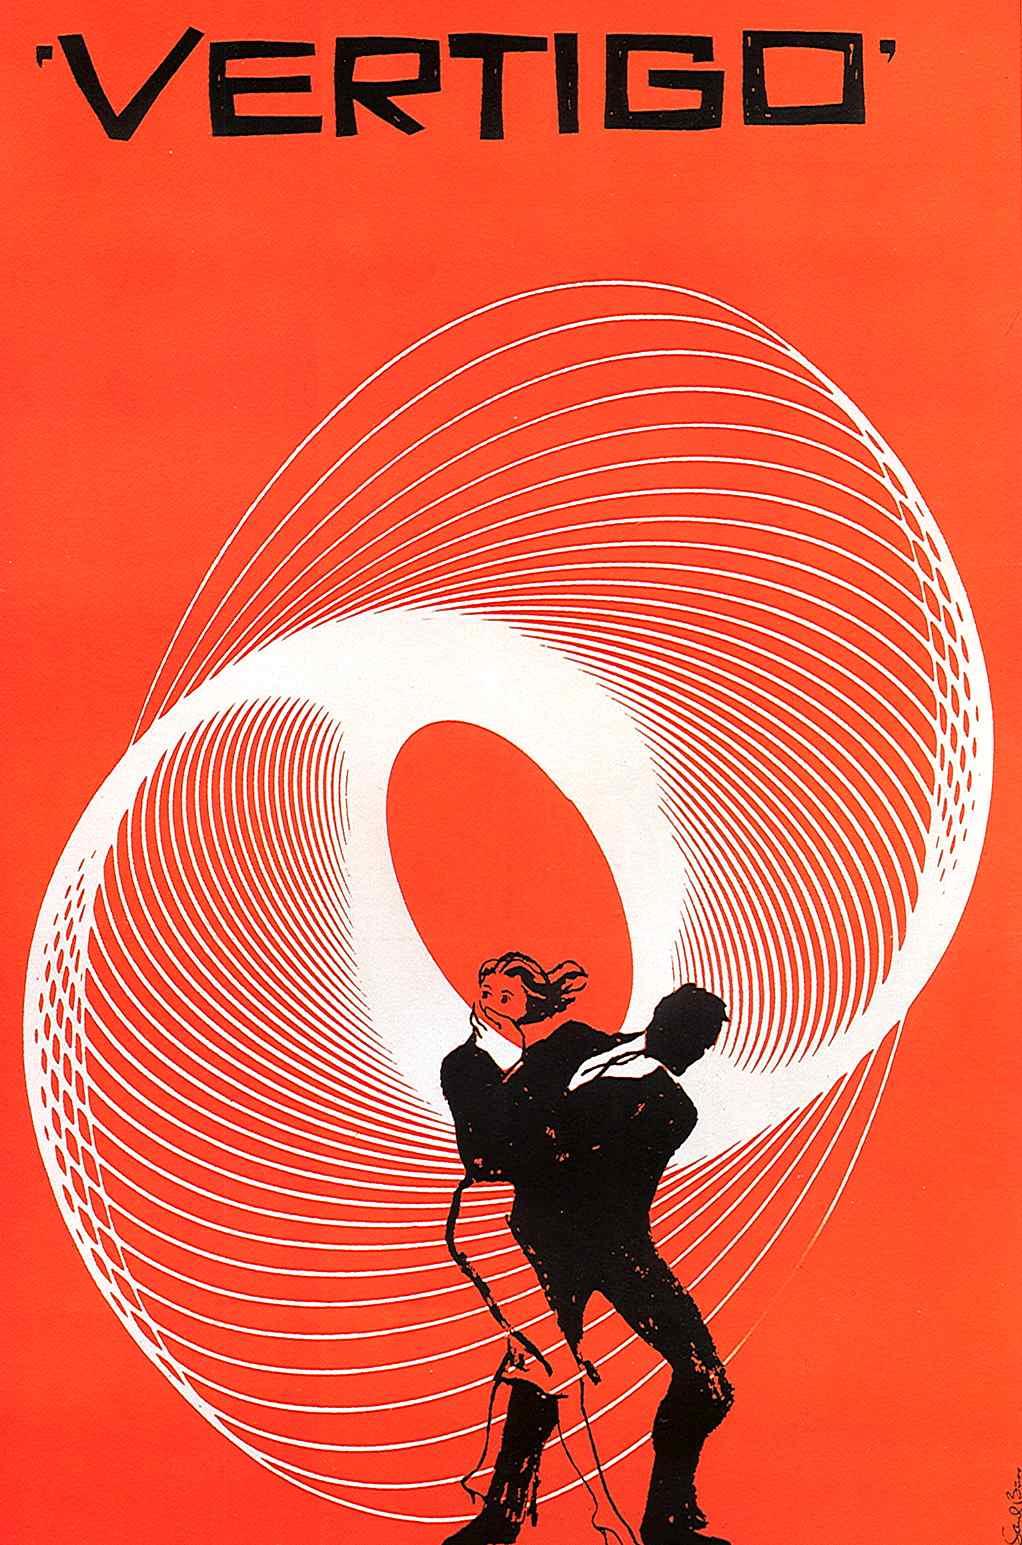 Saul Bass Vertigo poster in orange and black